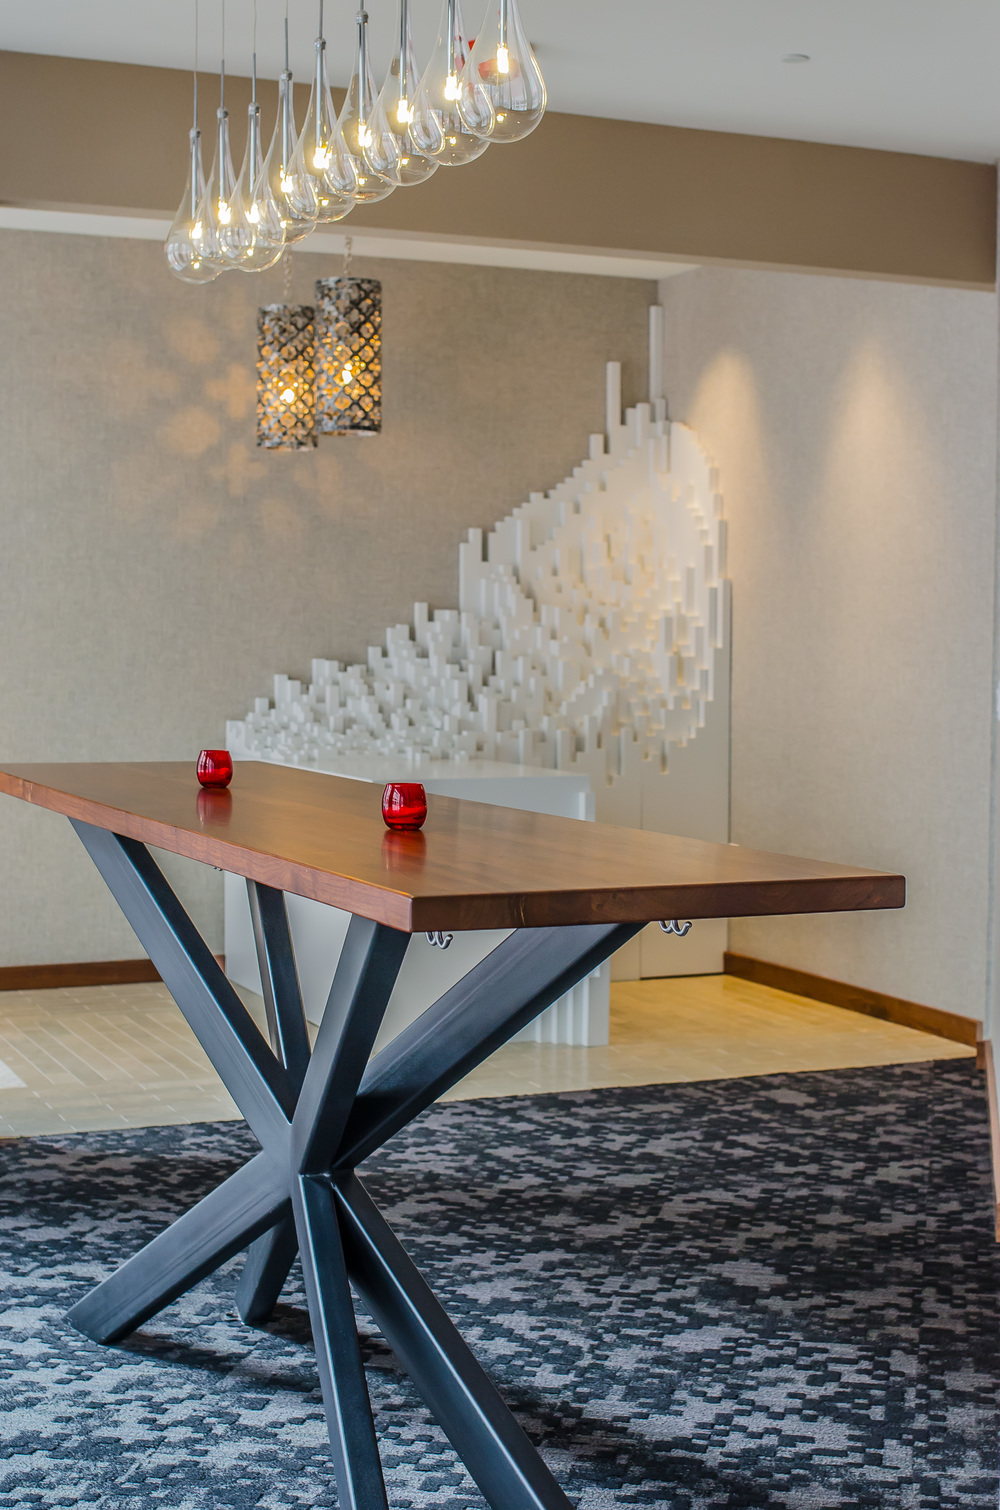 Restaurant Design San Francisco Bay Area - Cadence Restaurant - Custom Standing Table Custom Sculpture Host Desk